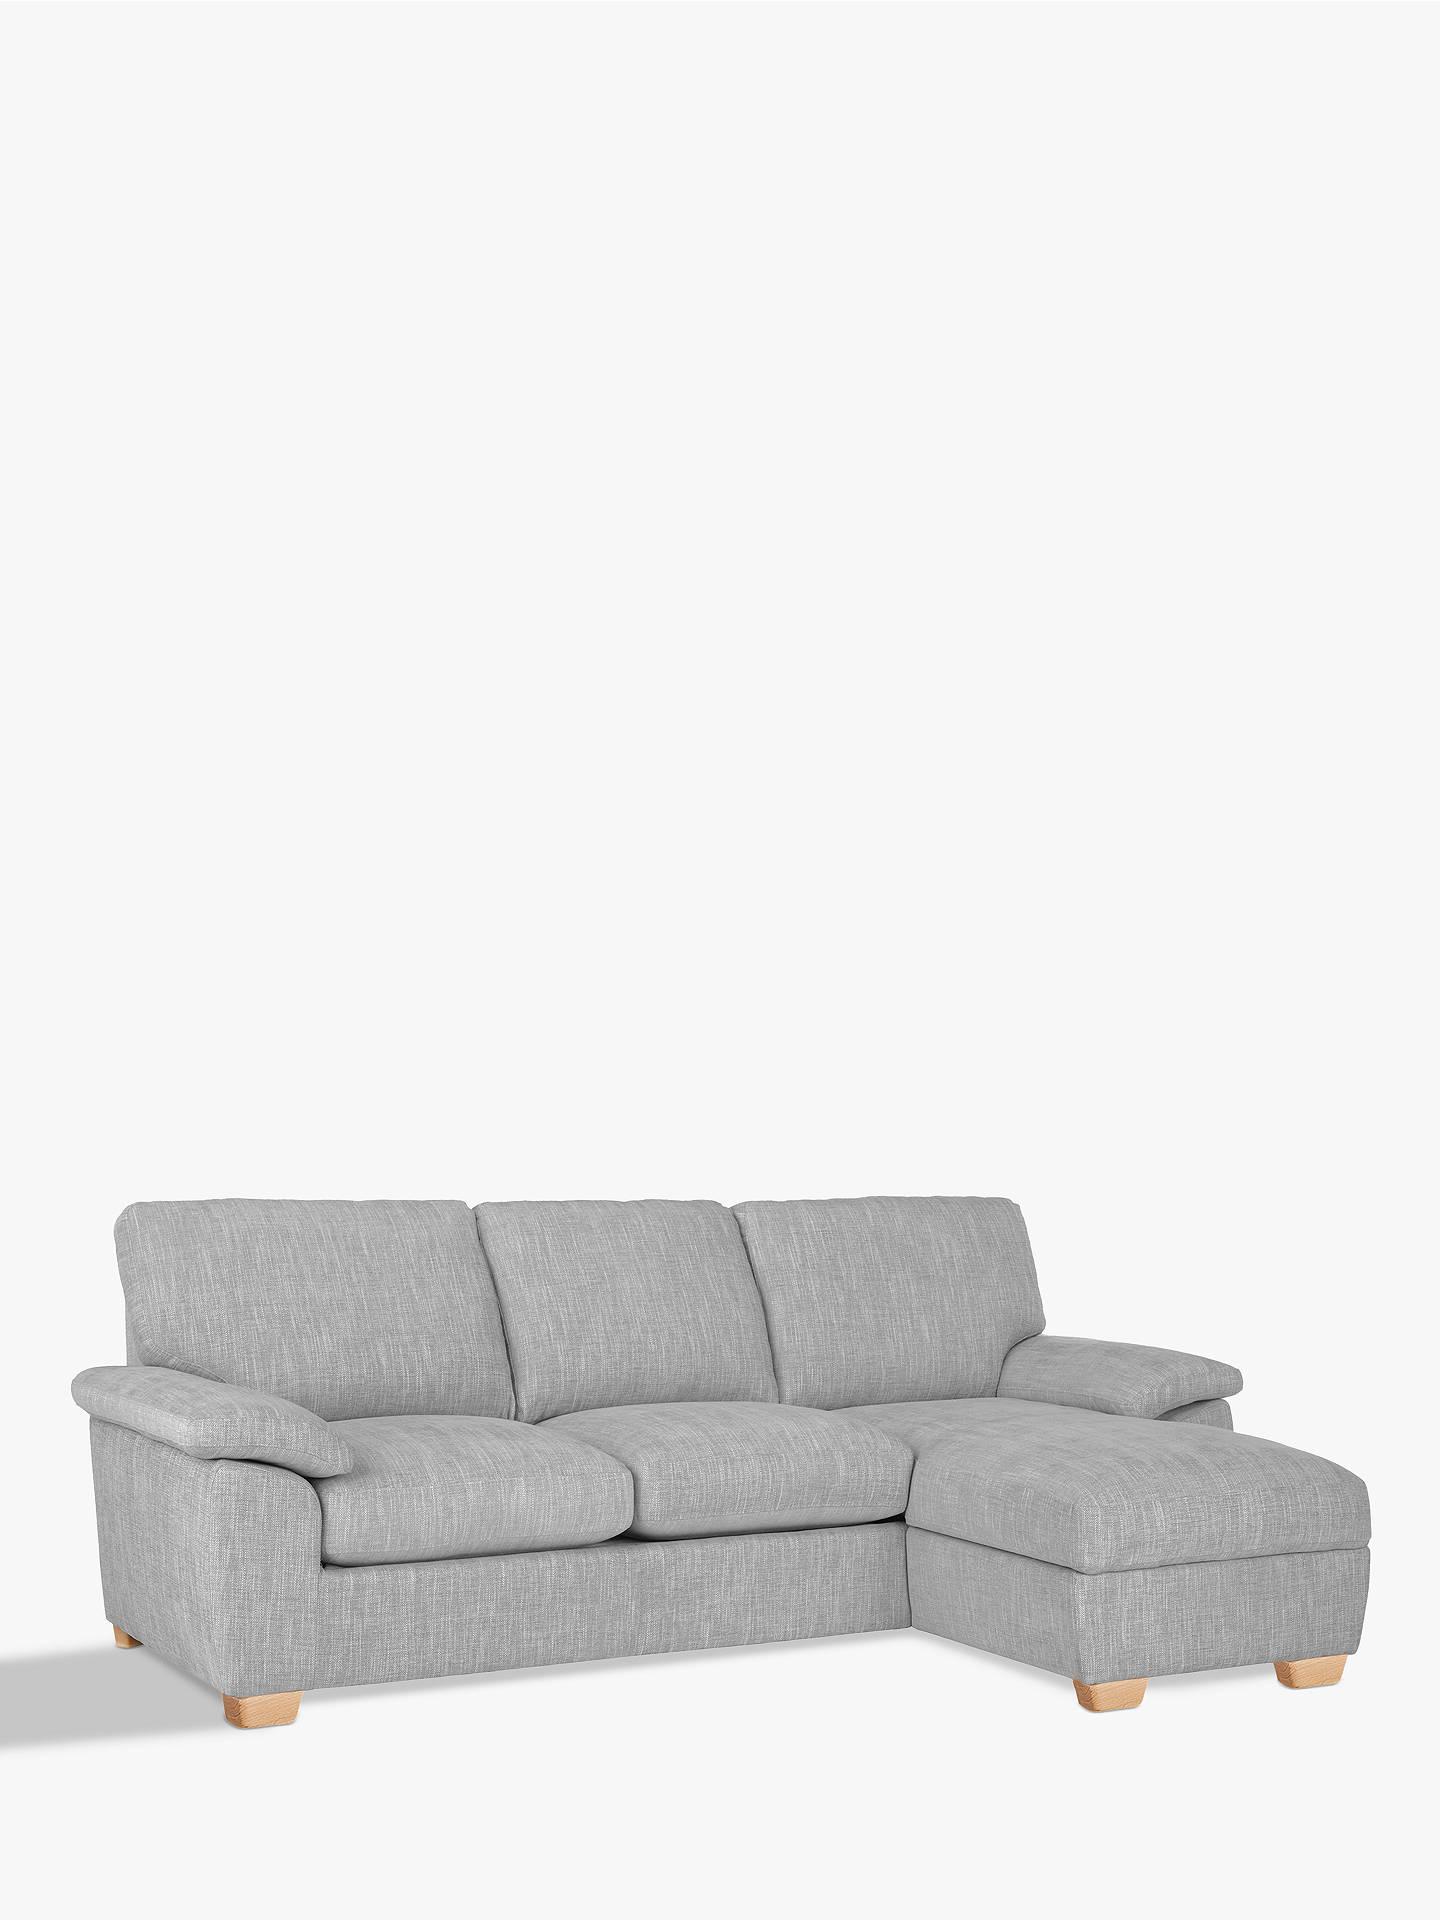 John Lewis Partners Camden Rhf Storage Chaise End Sofa Bed At John